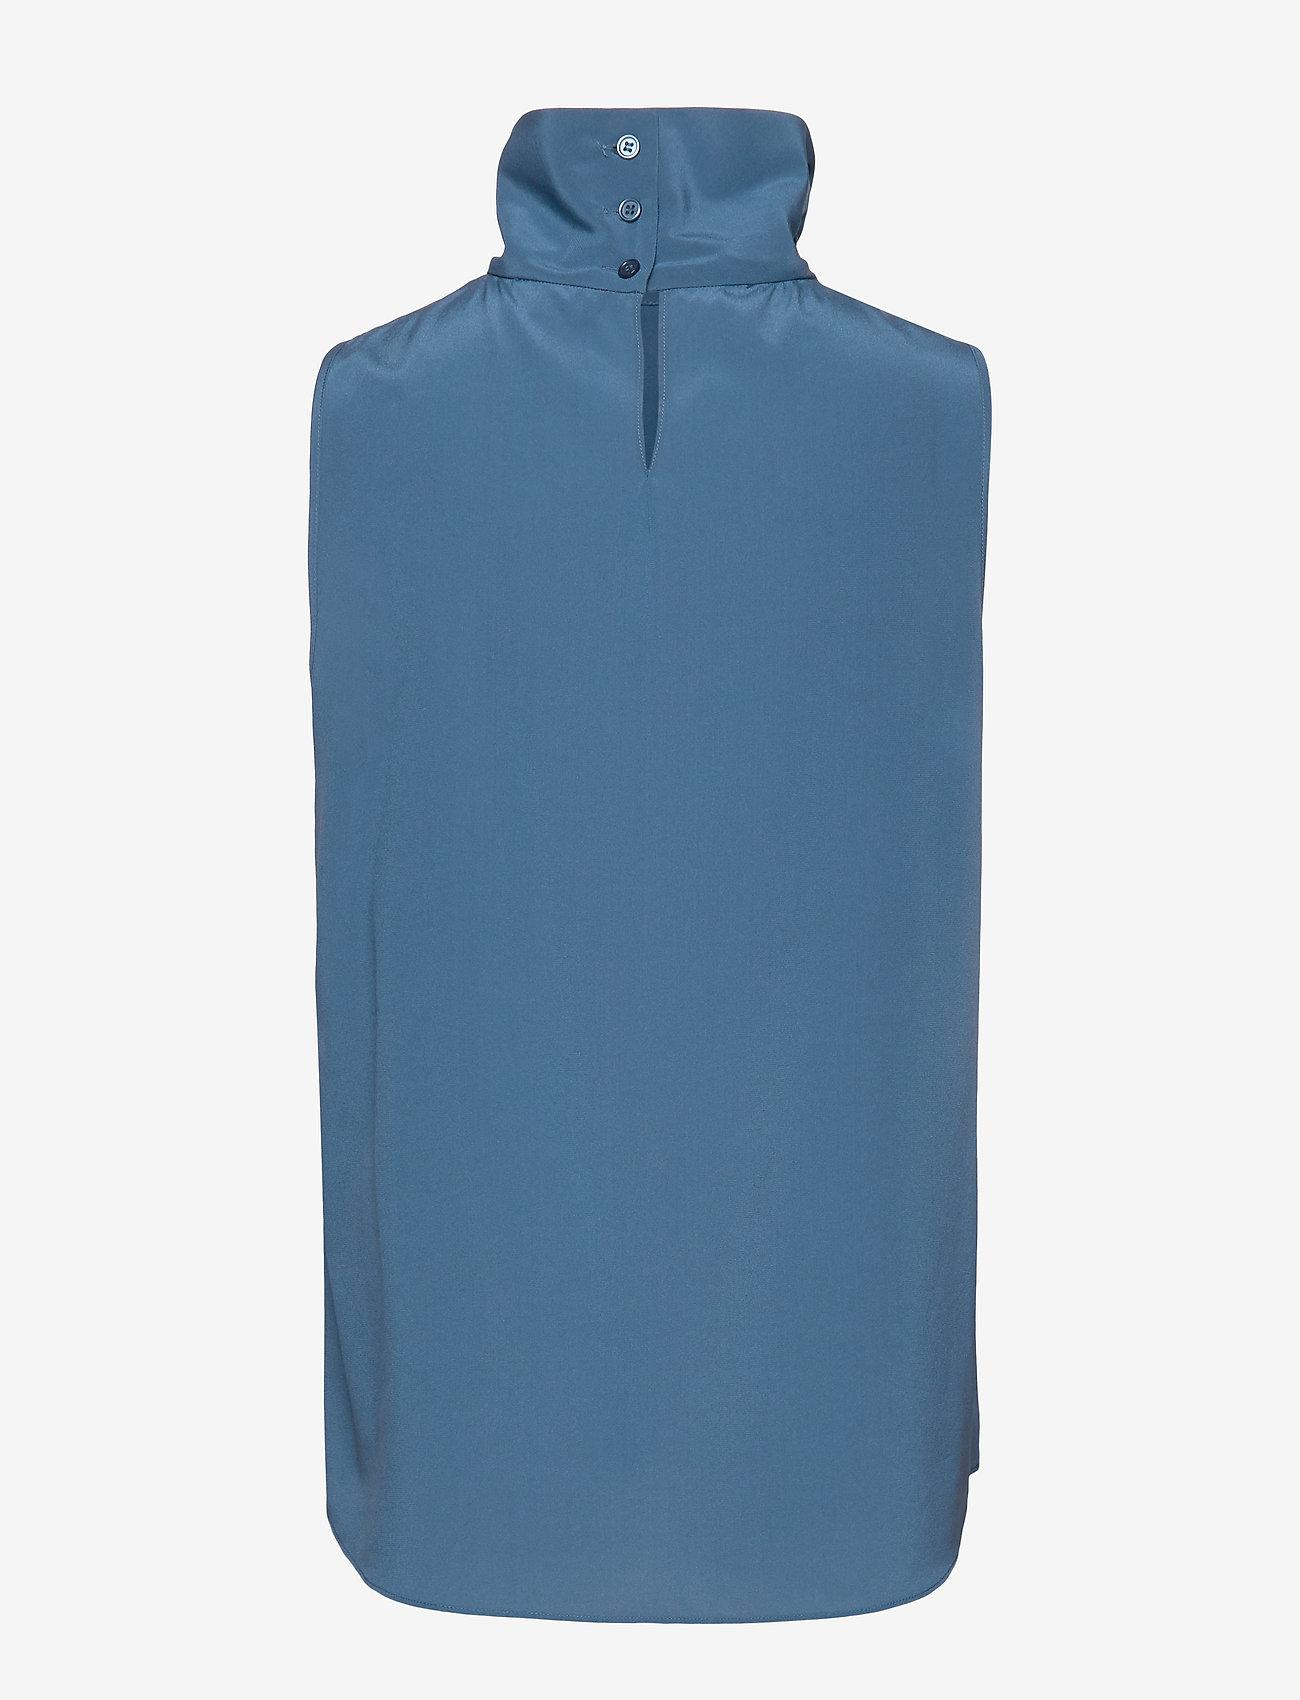 SAND CDC Stretch - Prosa Top - Bluser & Skjorter MEDIUM BLUE - Dameklær Spesialtilbud